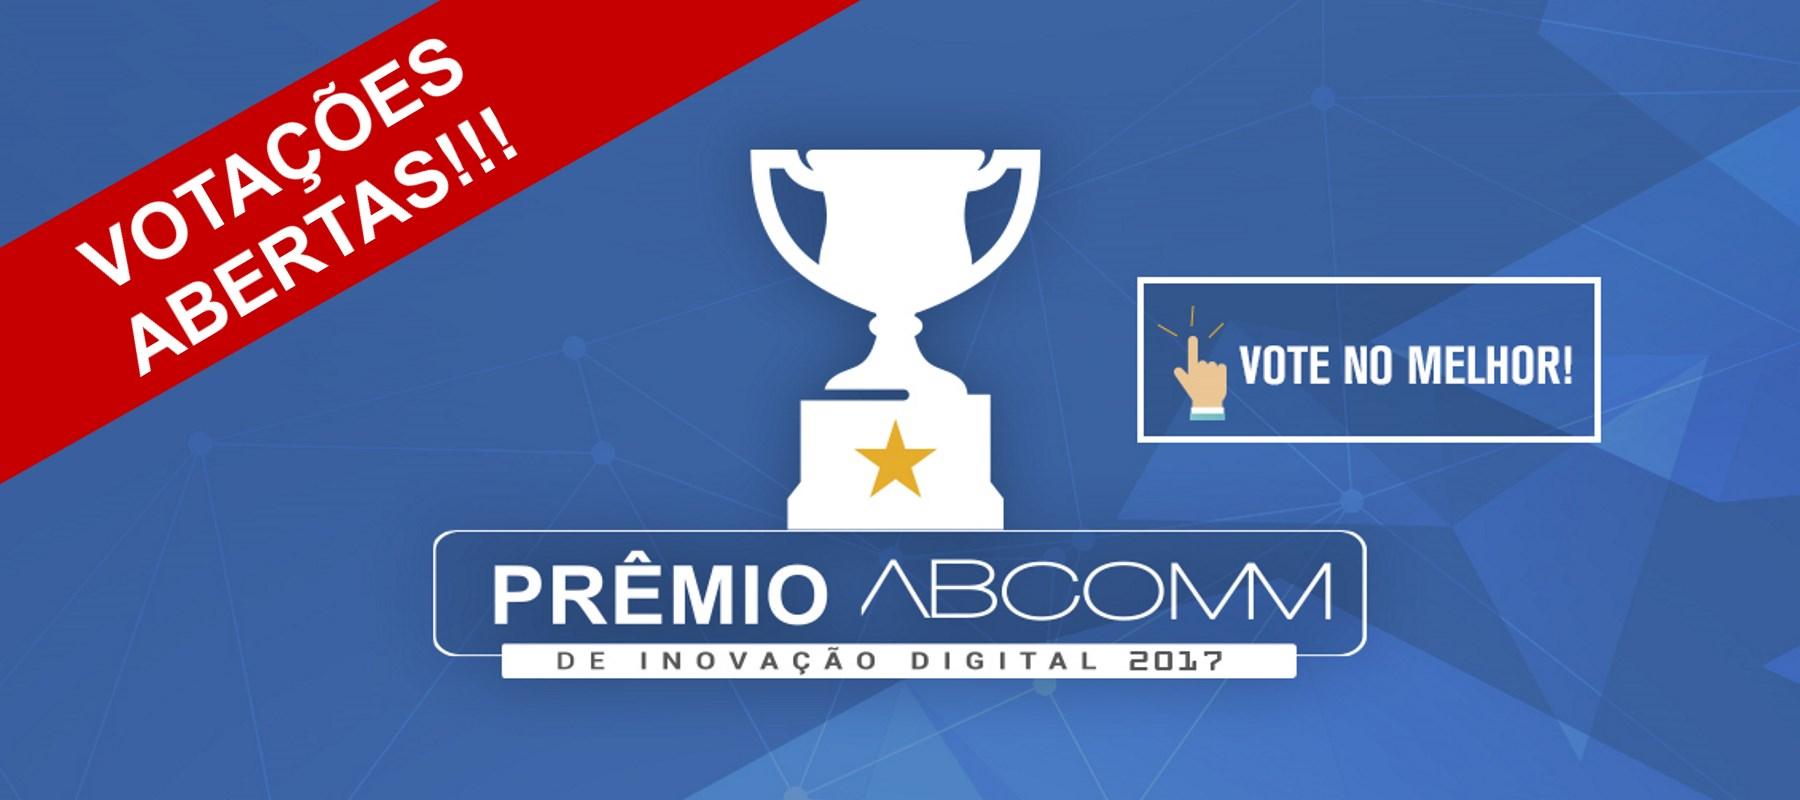 votaca-aberta-abcomm-2017